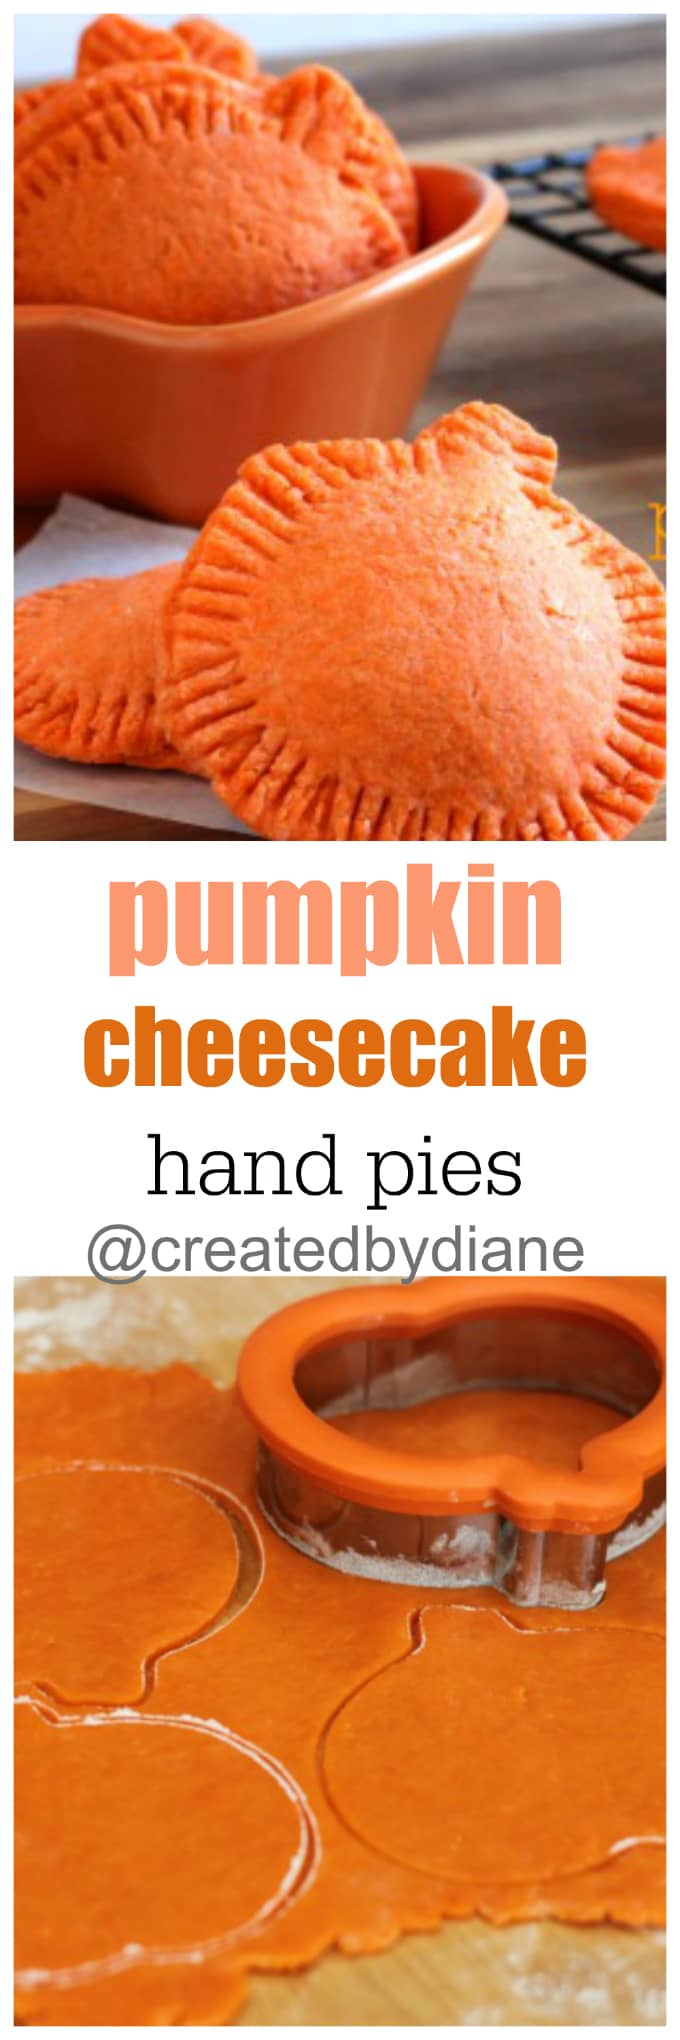 pumpkin-cheesecake-hand-pies-createdbydiane